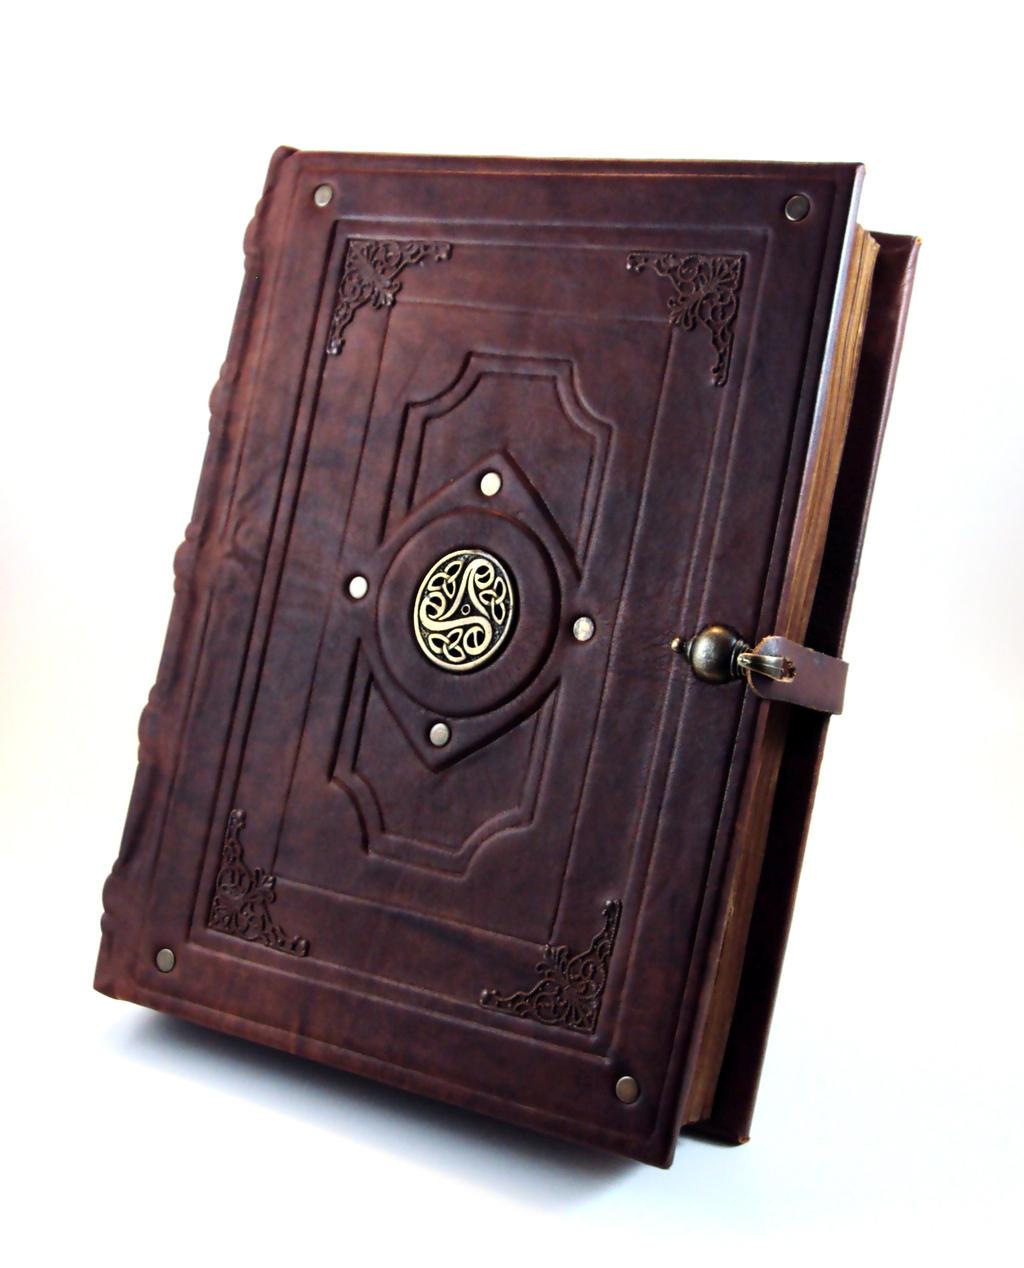 Gótika: Ötödik Évad - Apokalipszis Antique_book_replica_by_millecuirs-d65co4y